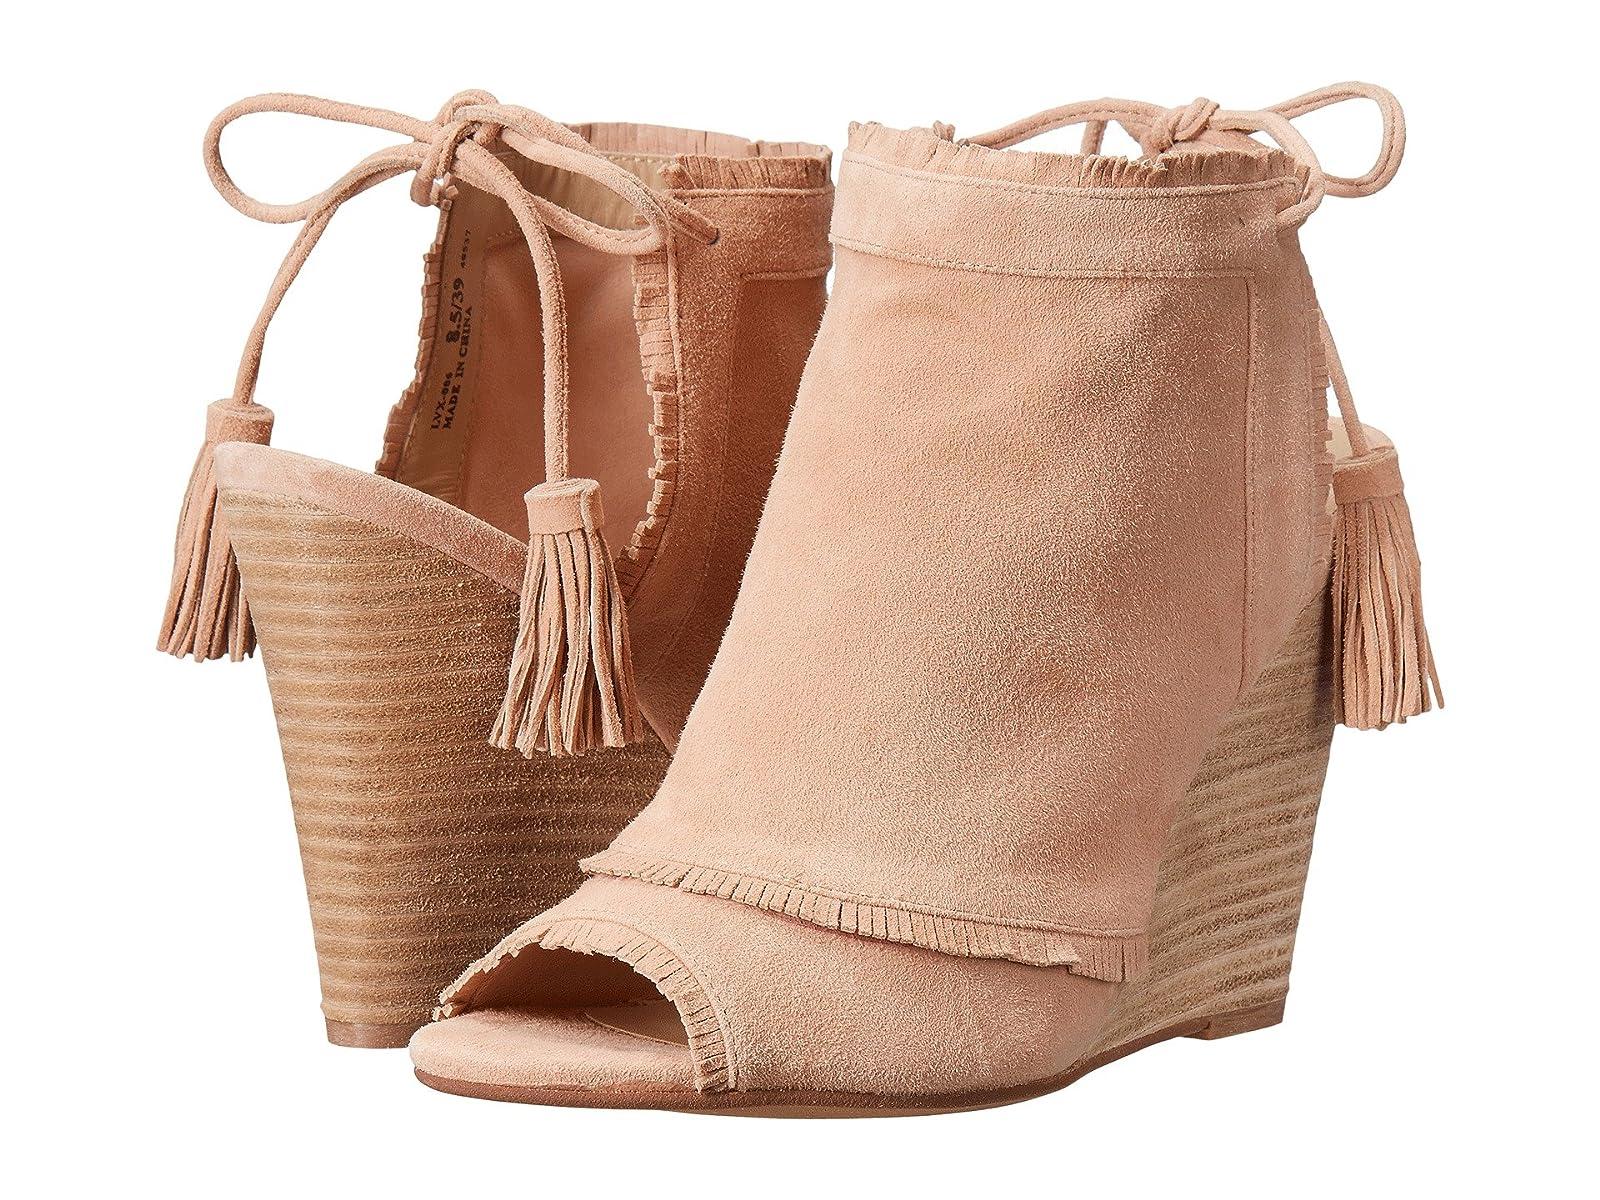 Kristin Cavallari Latakia Wedge SandalCheap and distinctive eye-catching shoes